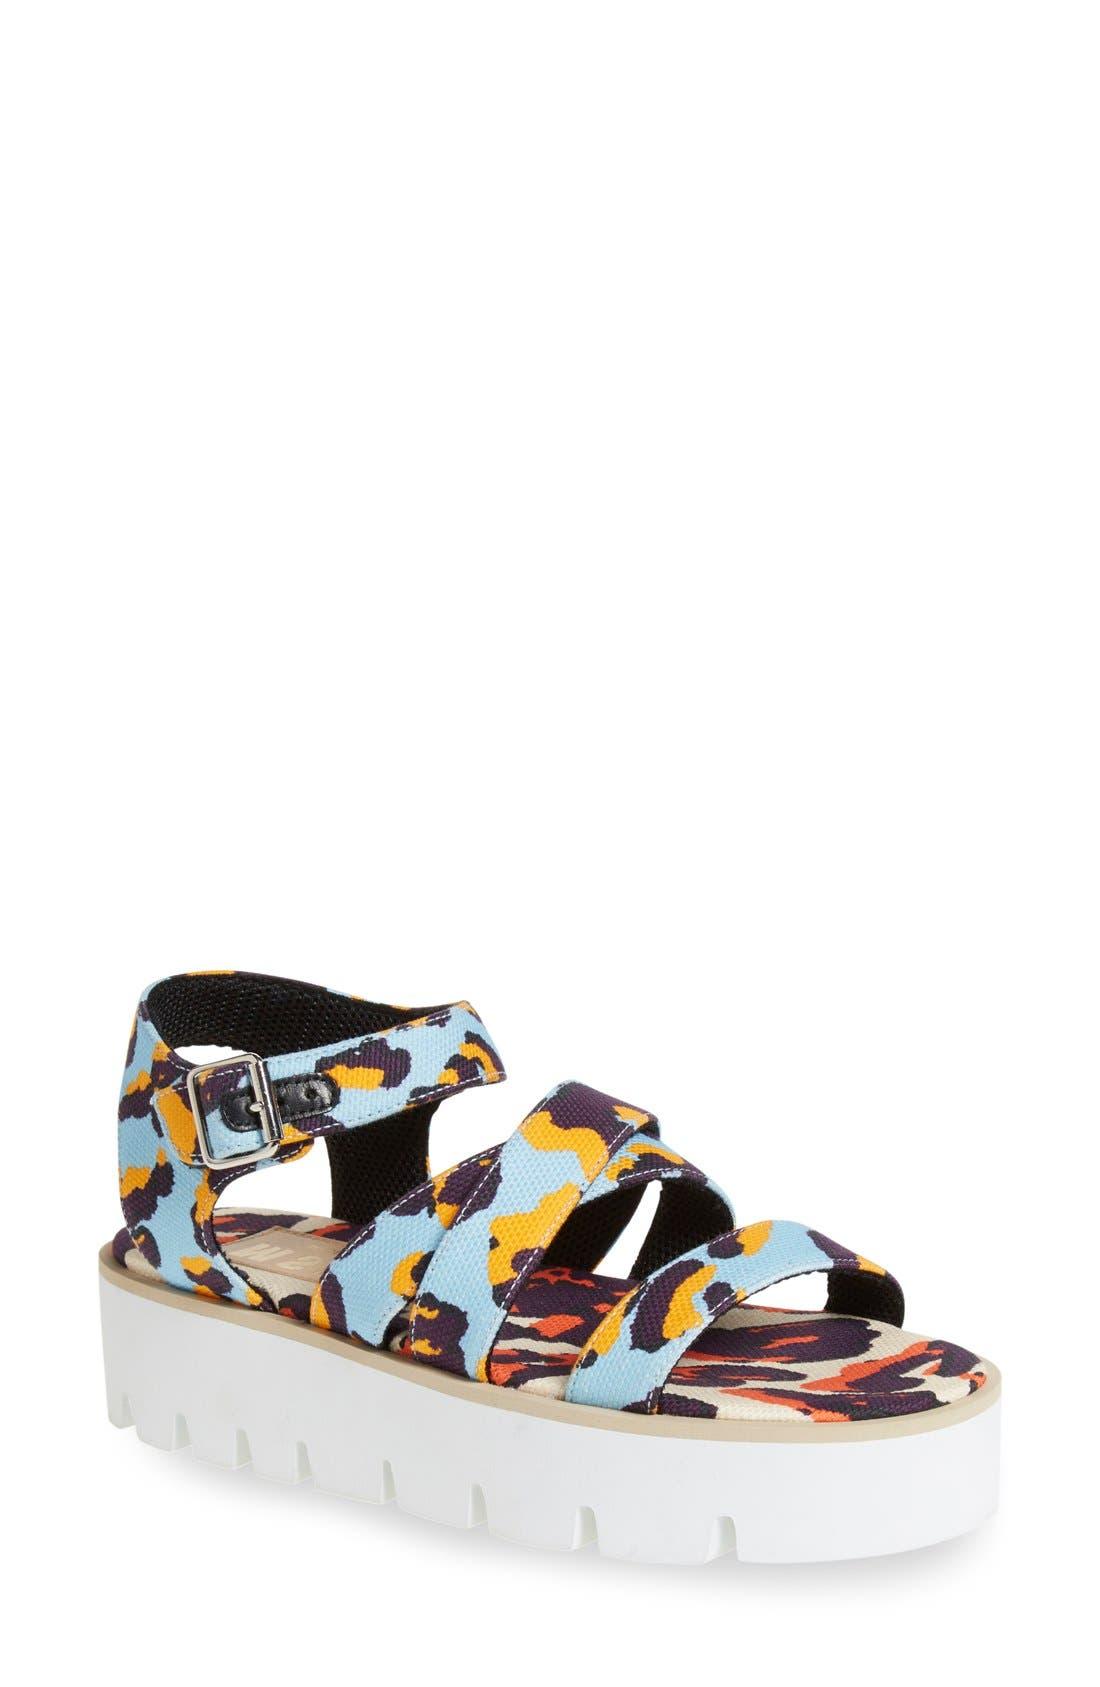 Alternate Image 1 Selected - MSGM Platform Sandal (Women)